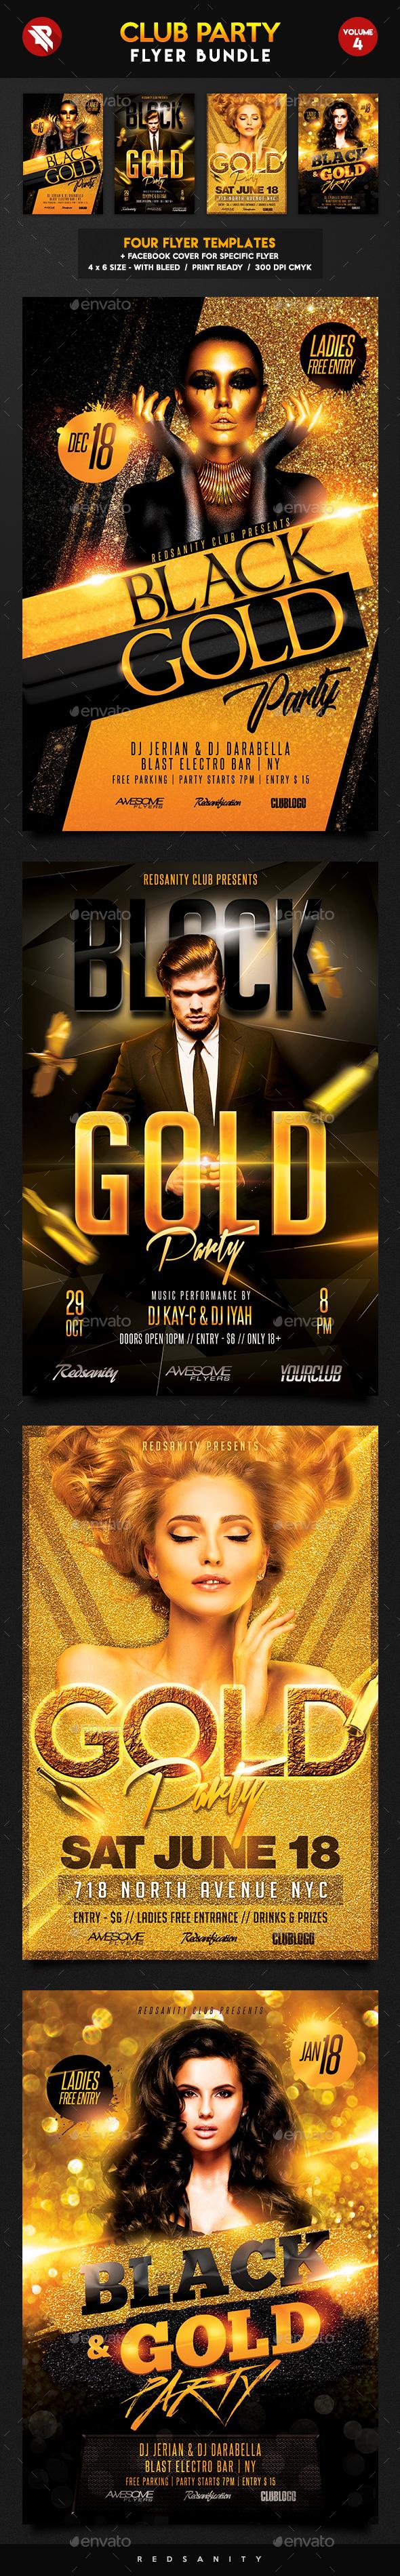 Club Flyer Bundle Vol.4 - Clubs & Parties Events